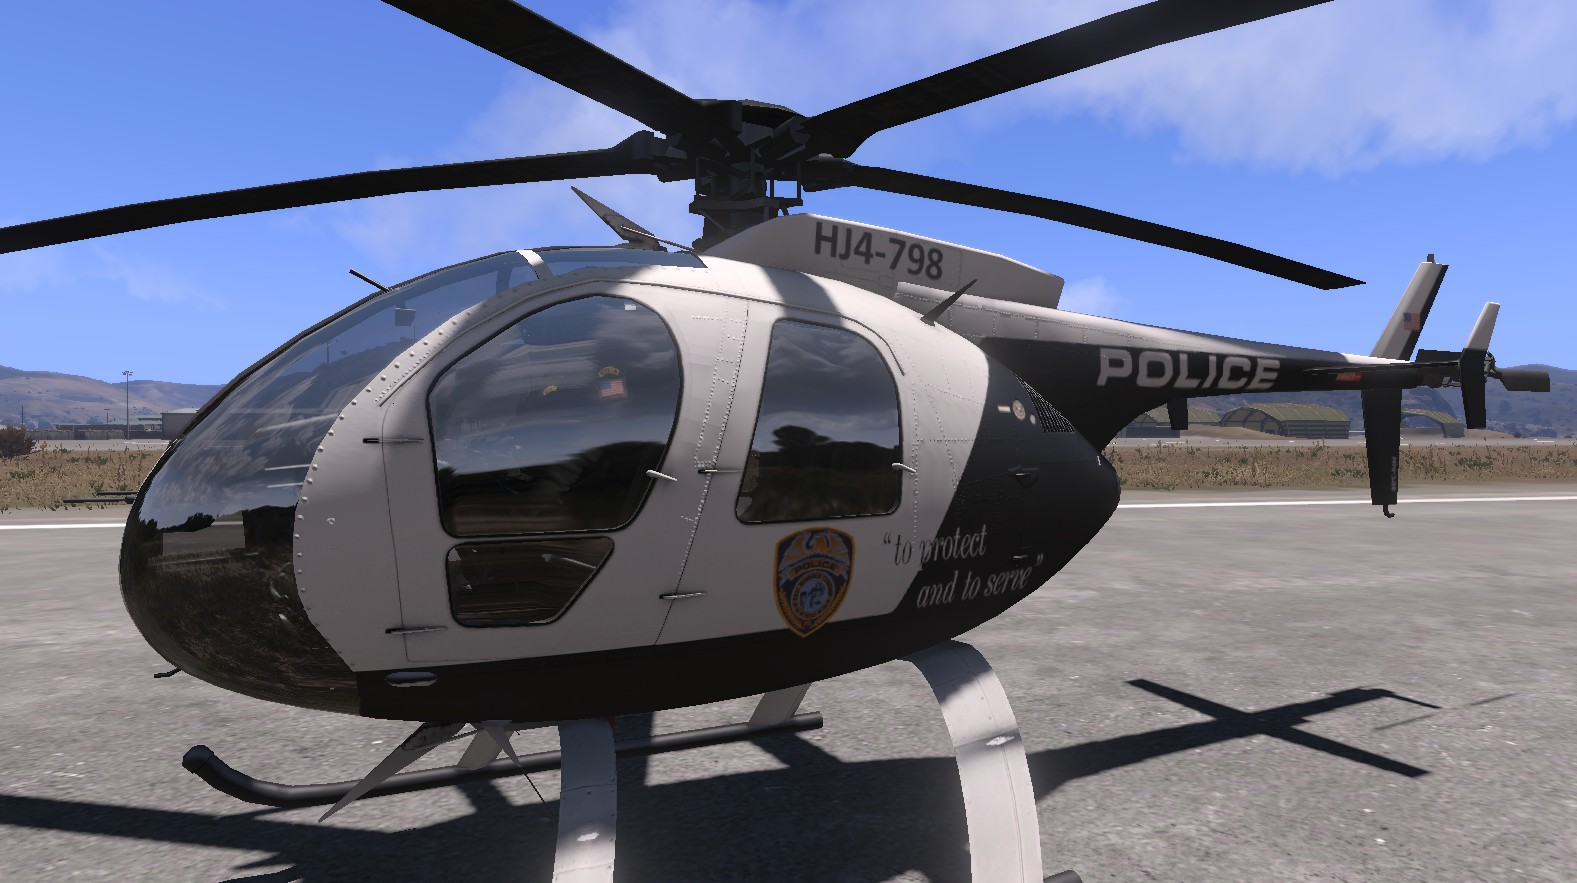 Arma 3 Elicottero : Police mod von demian v addon pack